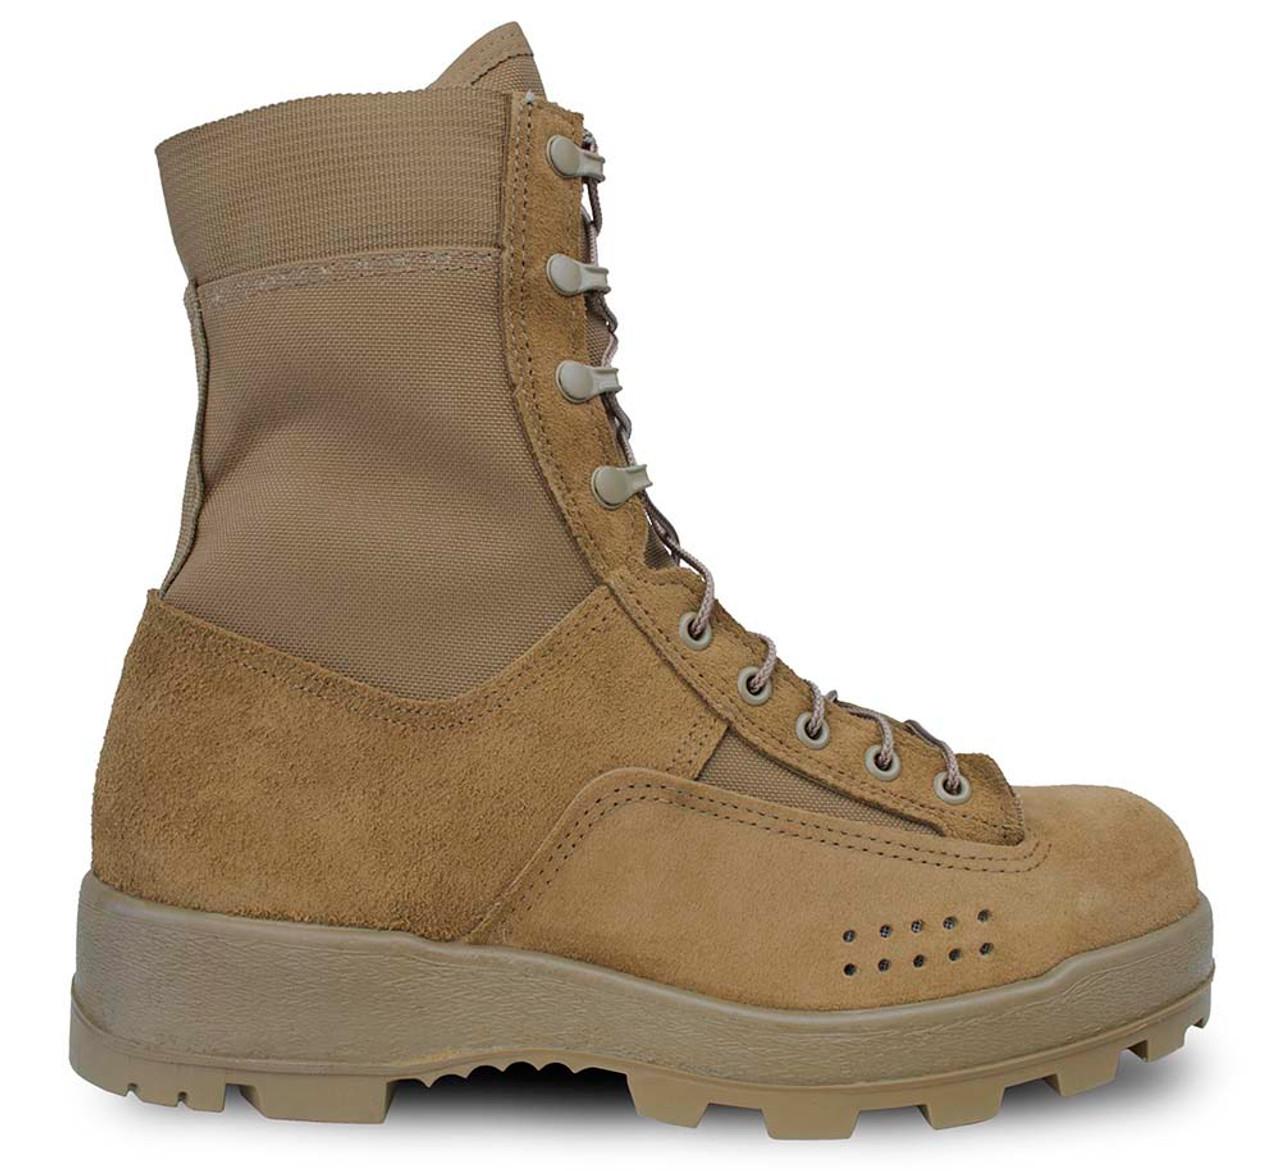 MCRAE JBII ARMY HOT WEATHER JUNGLE BOOTS 8701